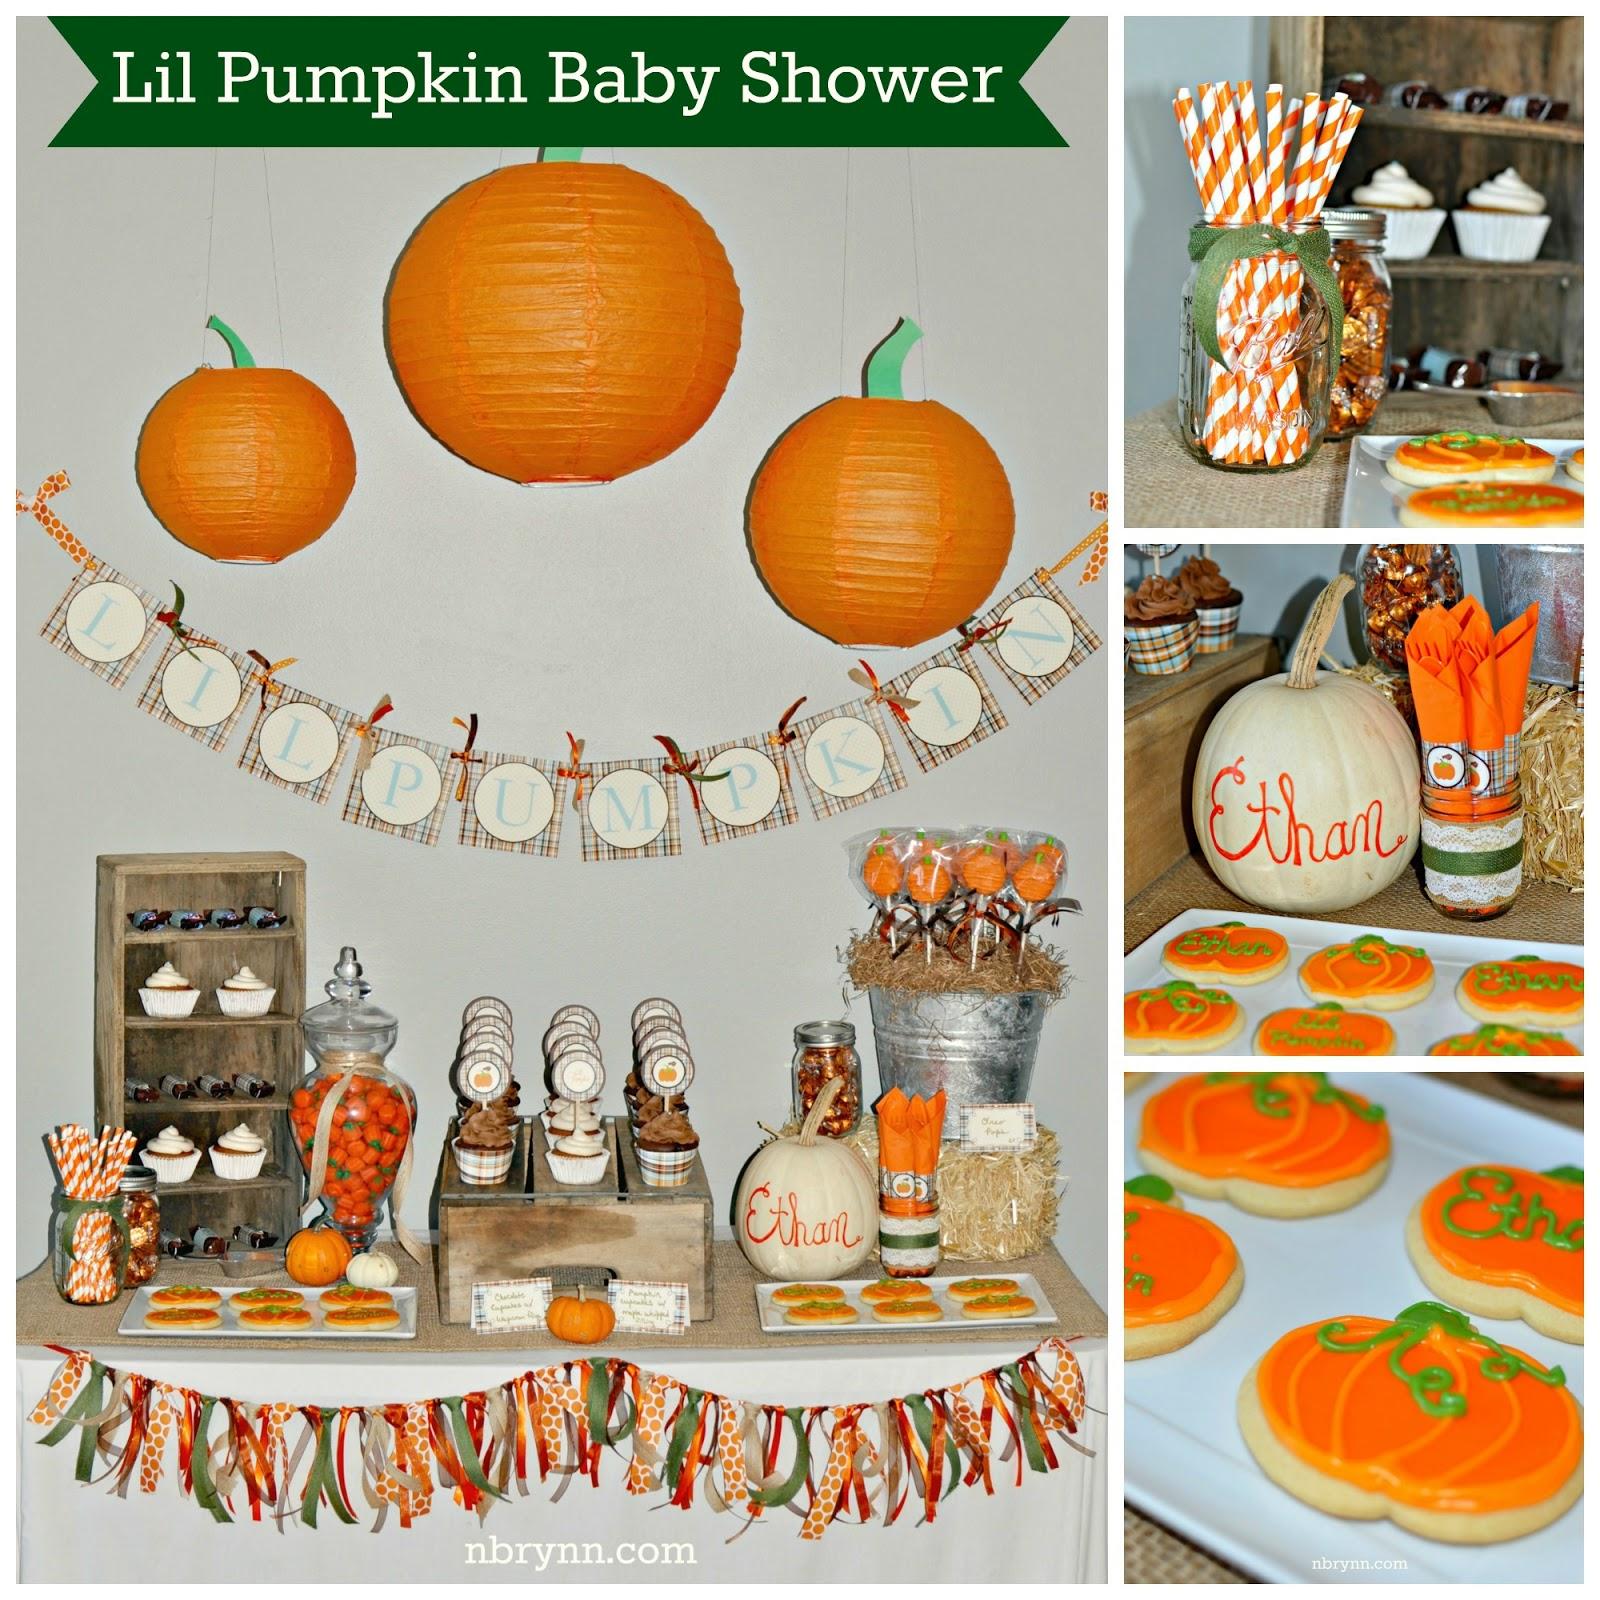 nbrynn lil pumpkin baby shower